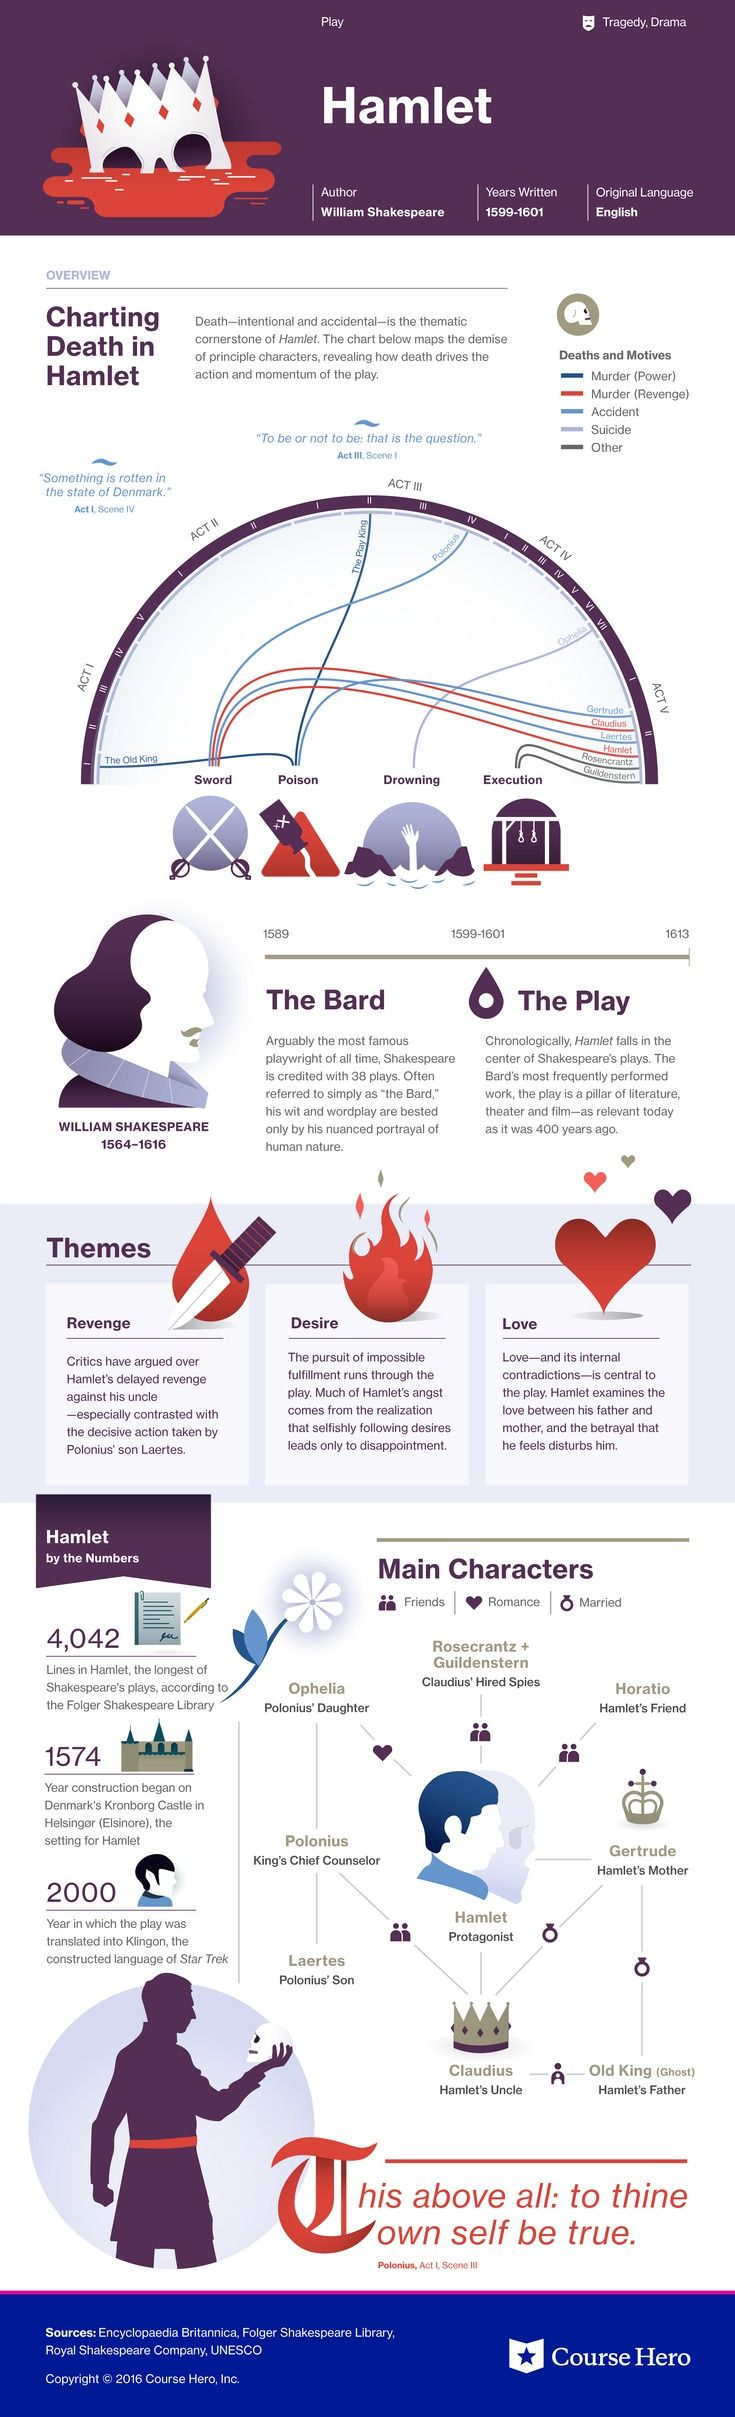 Thi Coursehero Infographic On Hamlet I Both Visually Stunning And Informative Teaching Literature British Shakespeare Theme Essay Of Madnes Revenge